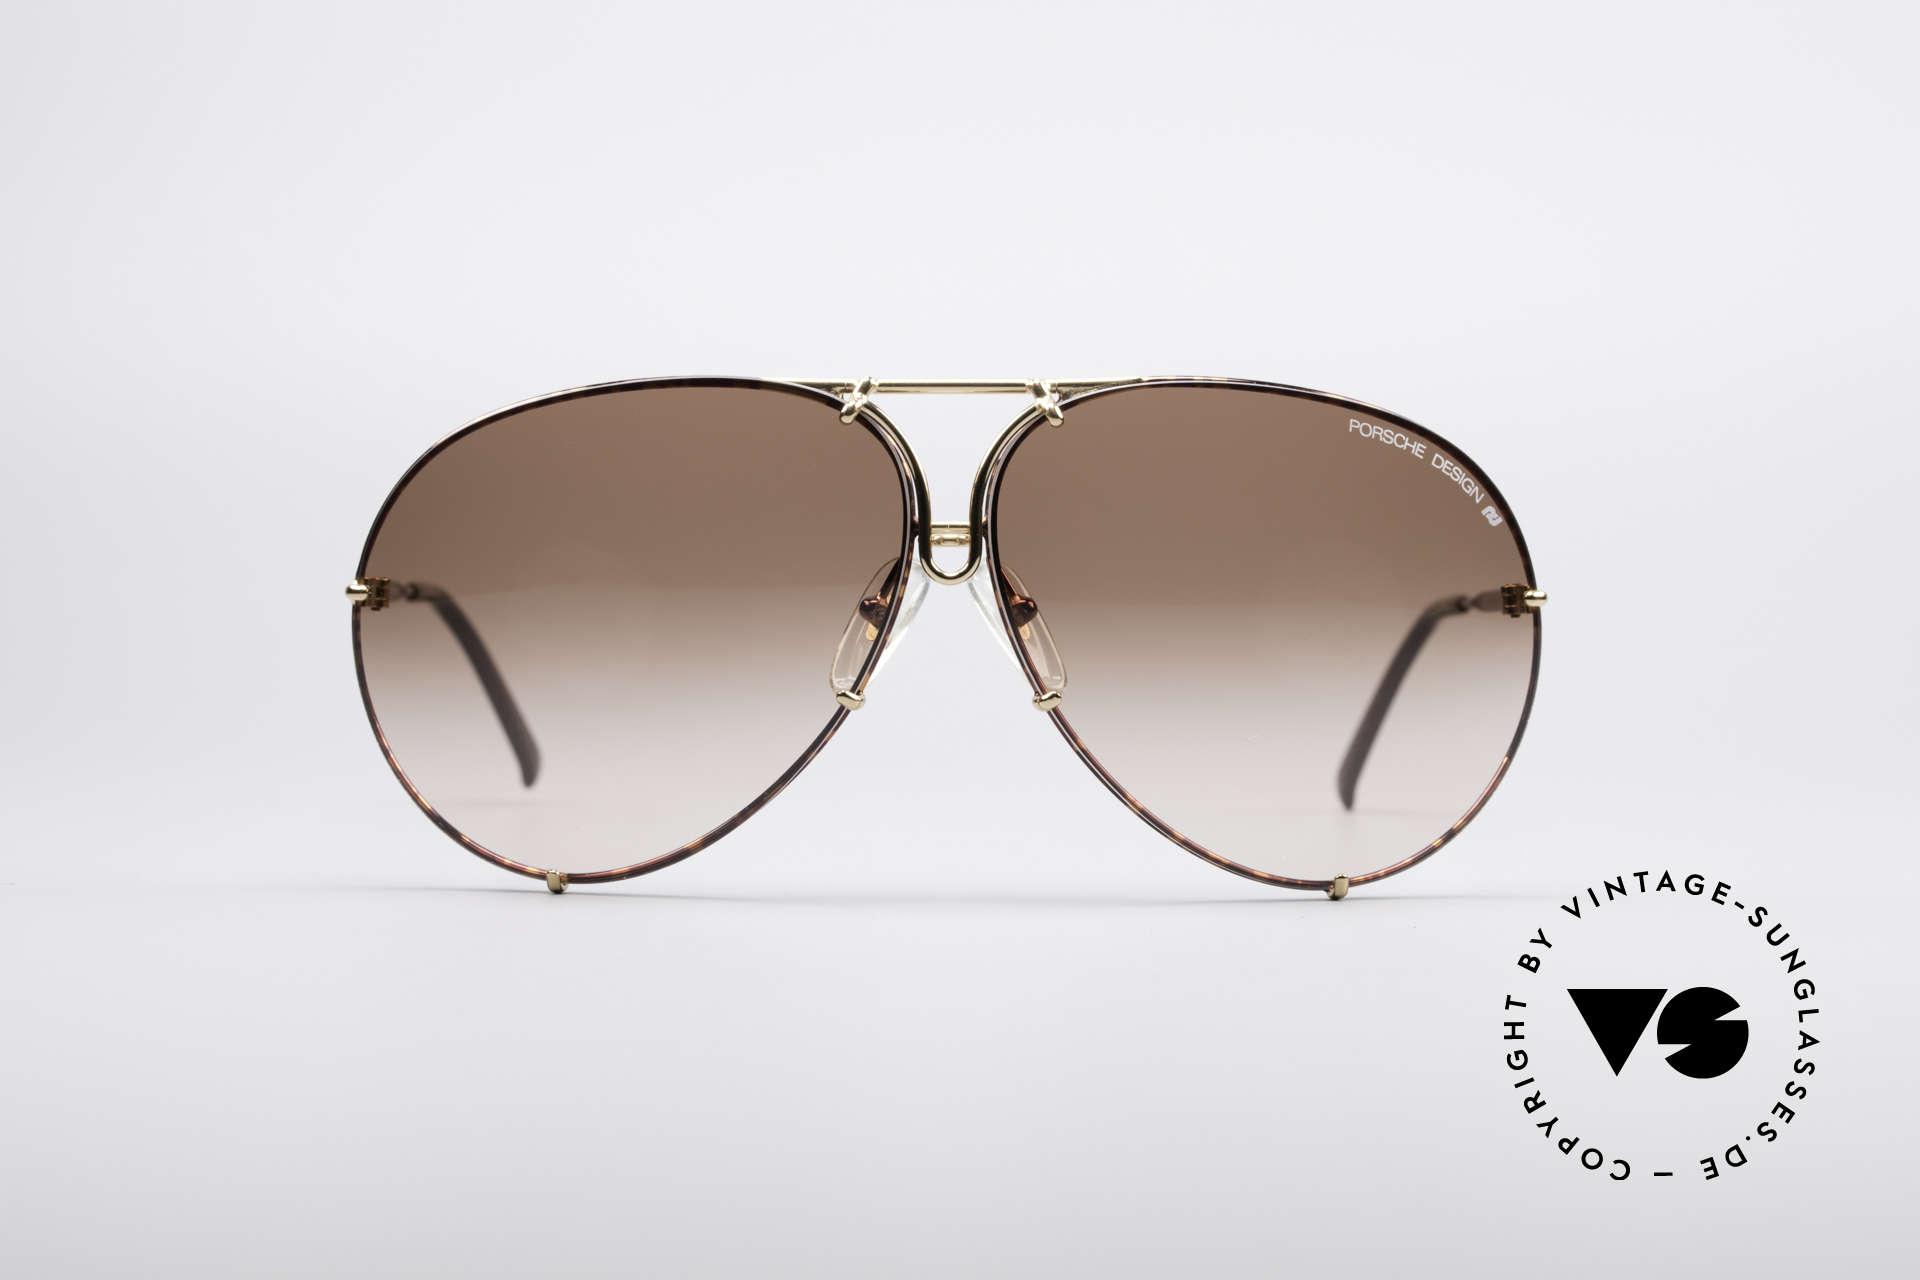 Sunglasses Porsche 5621 Large 80 s Aviator Shades   Vintage Sunglasses f1fe482dc6ad